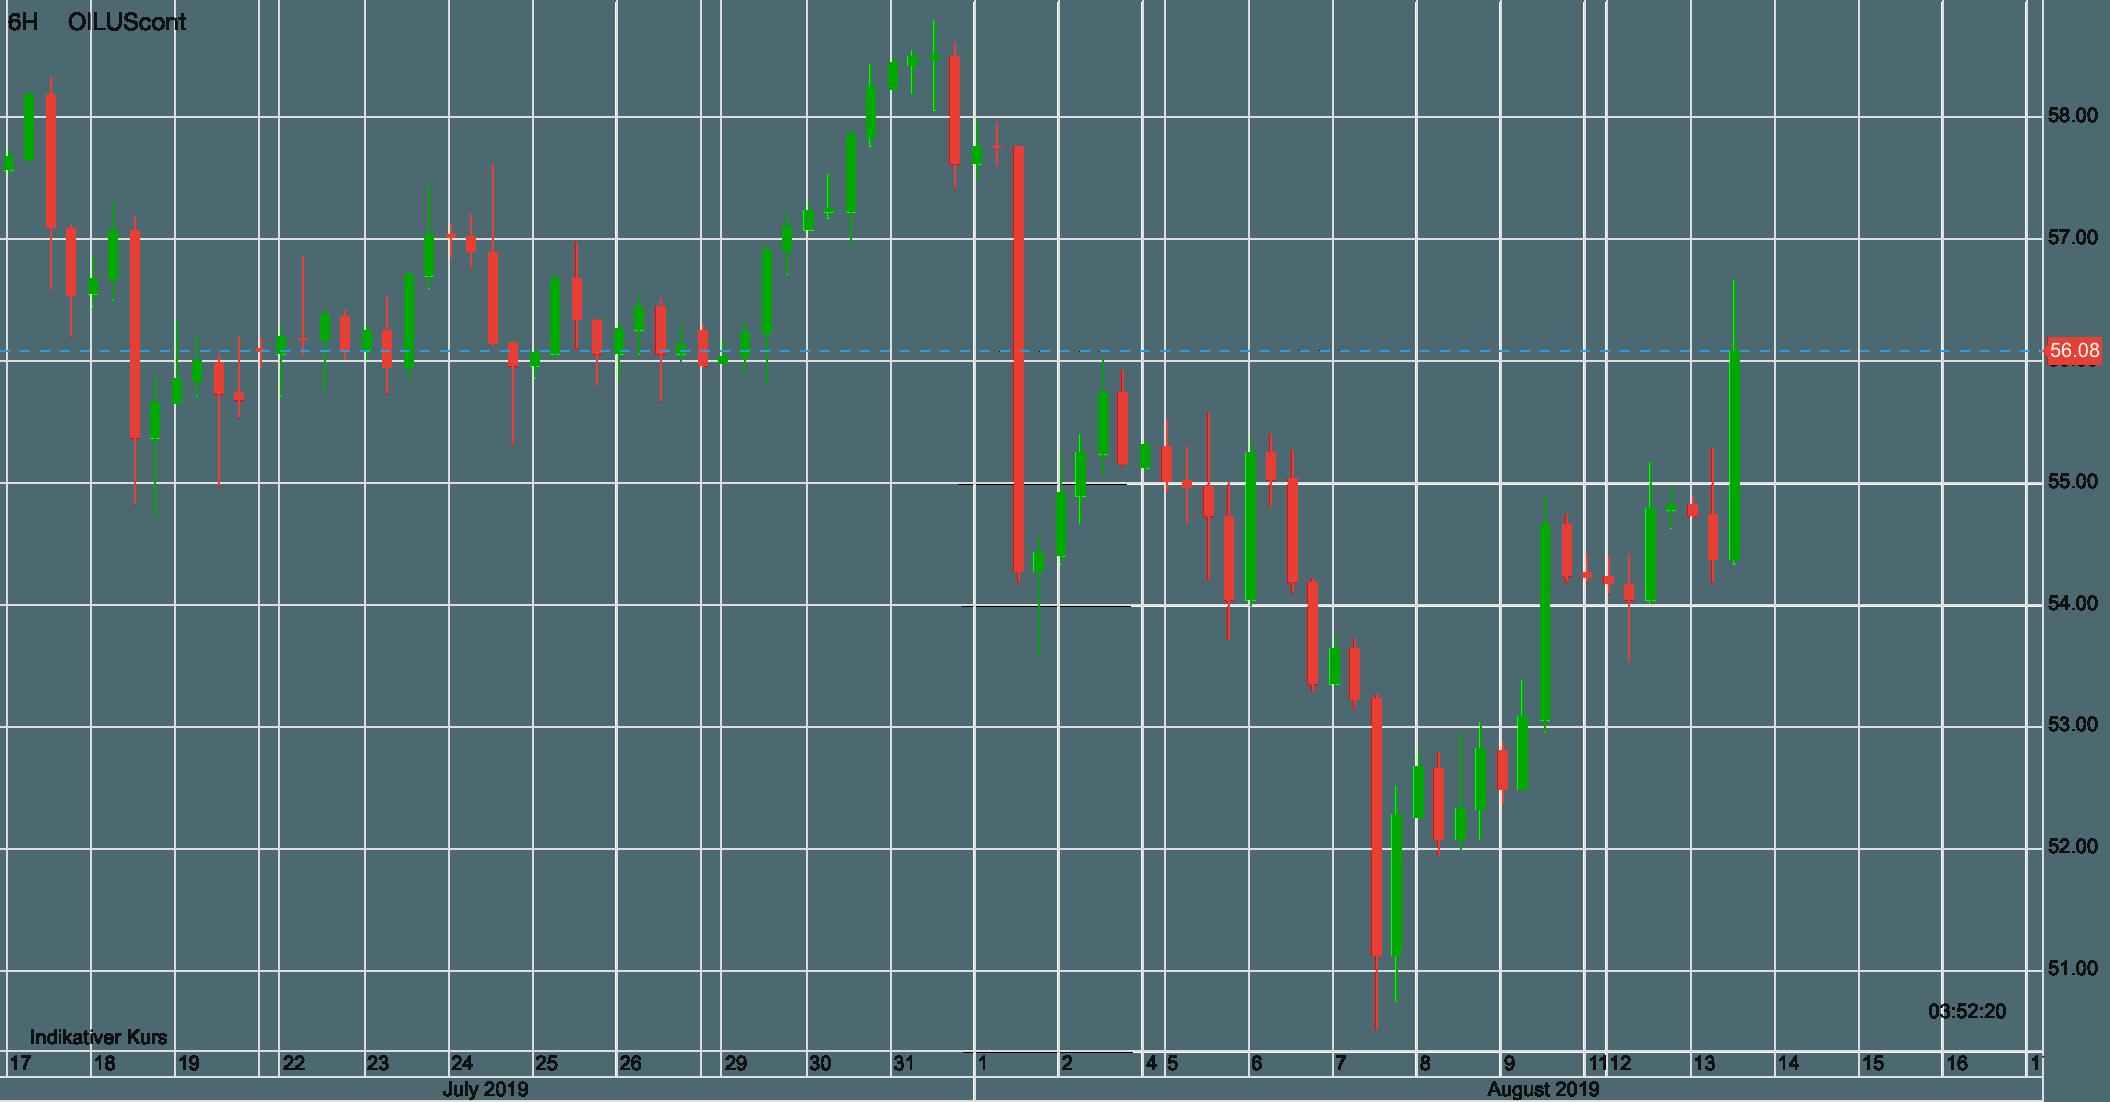 Ölpreis WTI seit dem 17. Juli